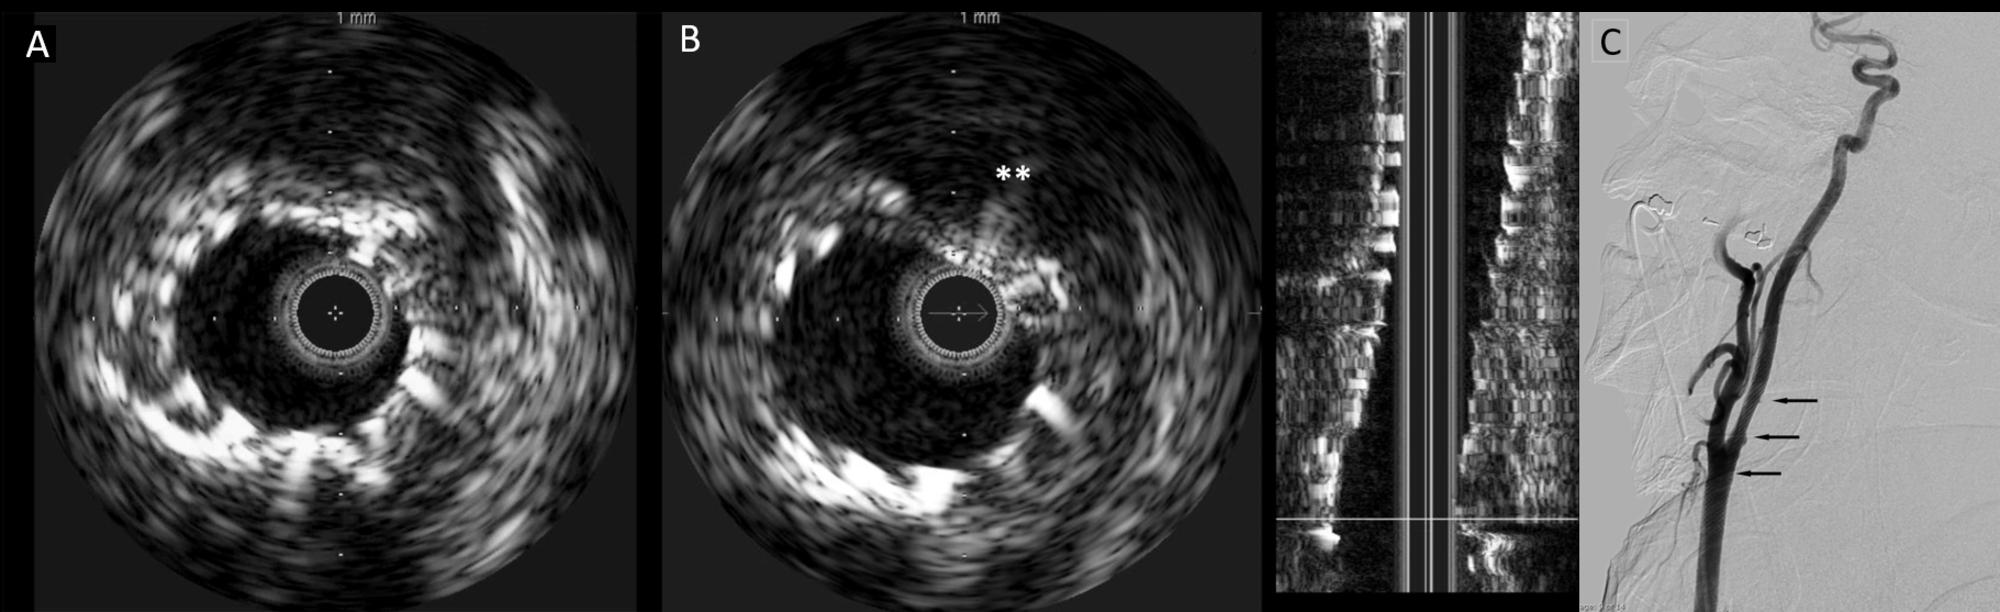 Cureus | Utility of Intravascular Ultrasound During Carotid